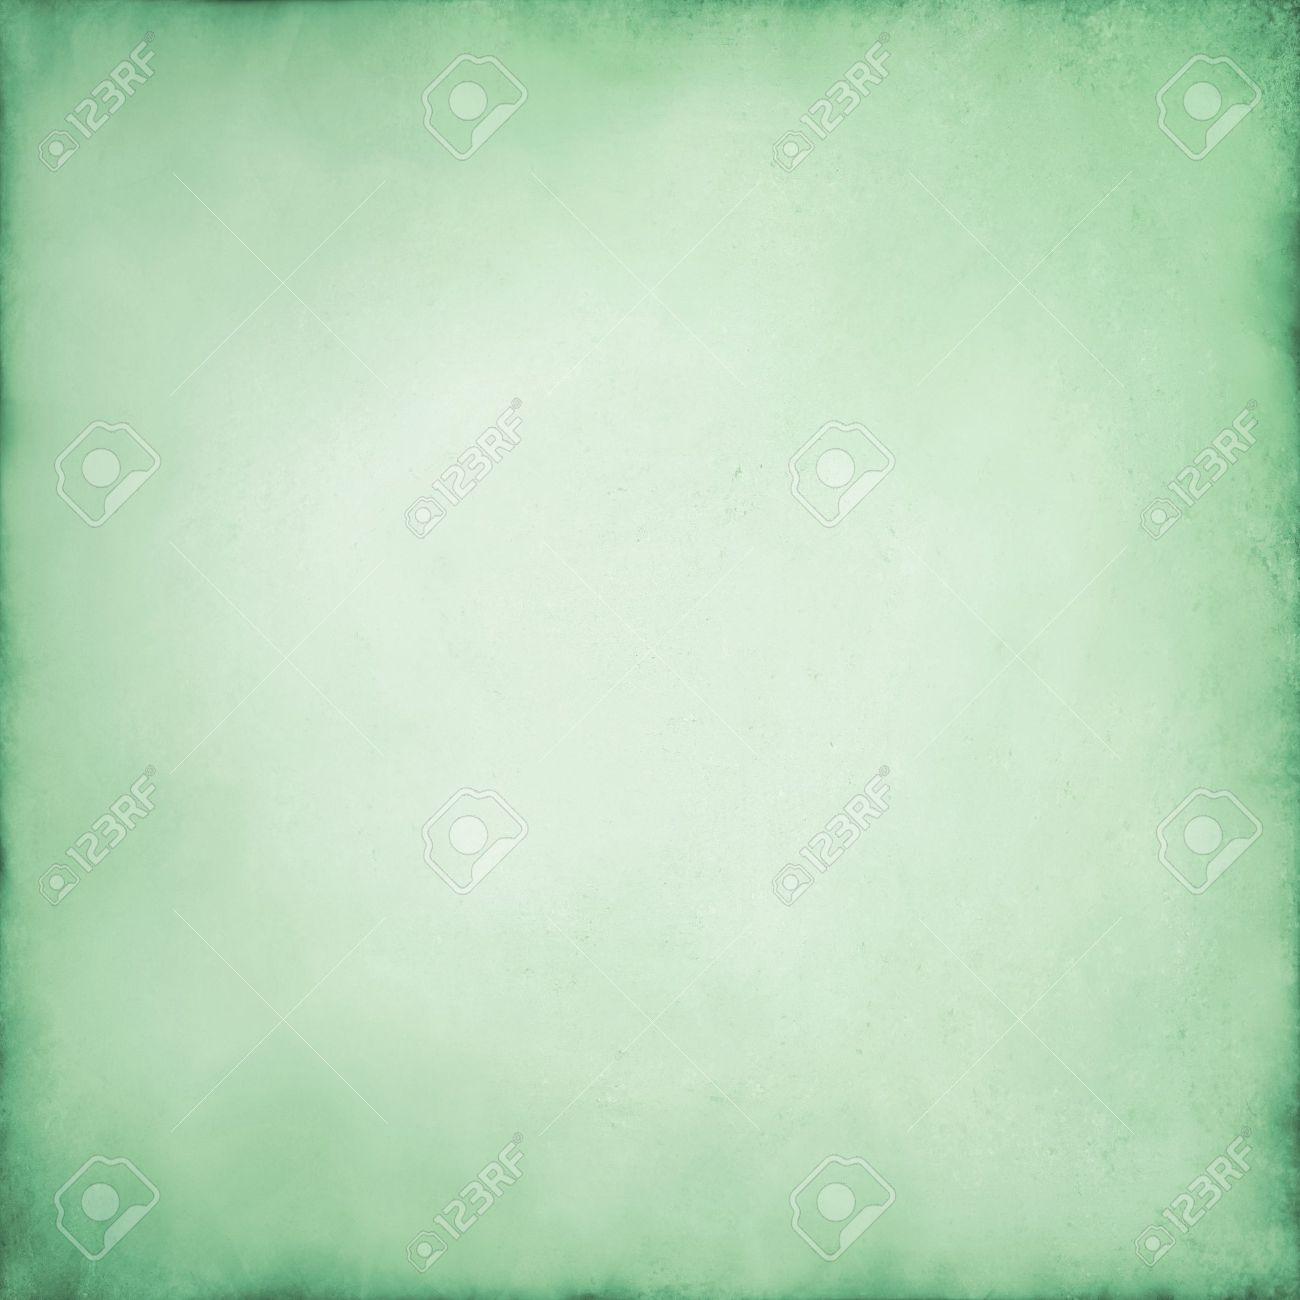 blue green background, soft elegant vintage grunge texture background abstract sponge design on wall illustration on paper or stationary, solid plain background for Easter, teal or turquoise color Stock Illustration - 18516555